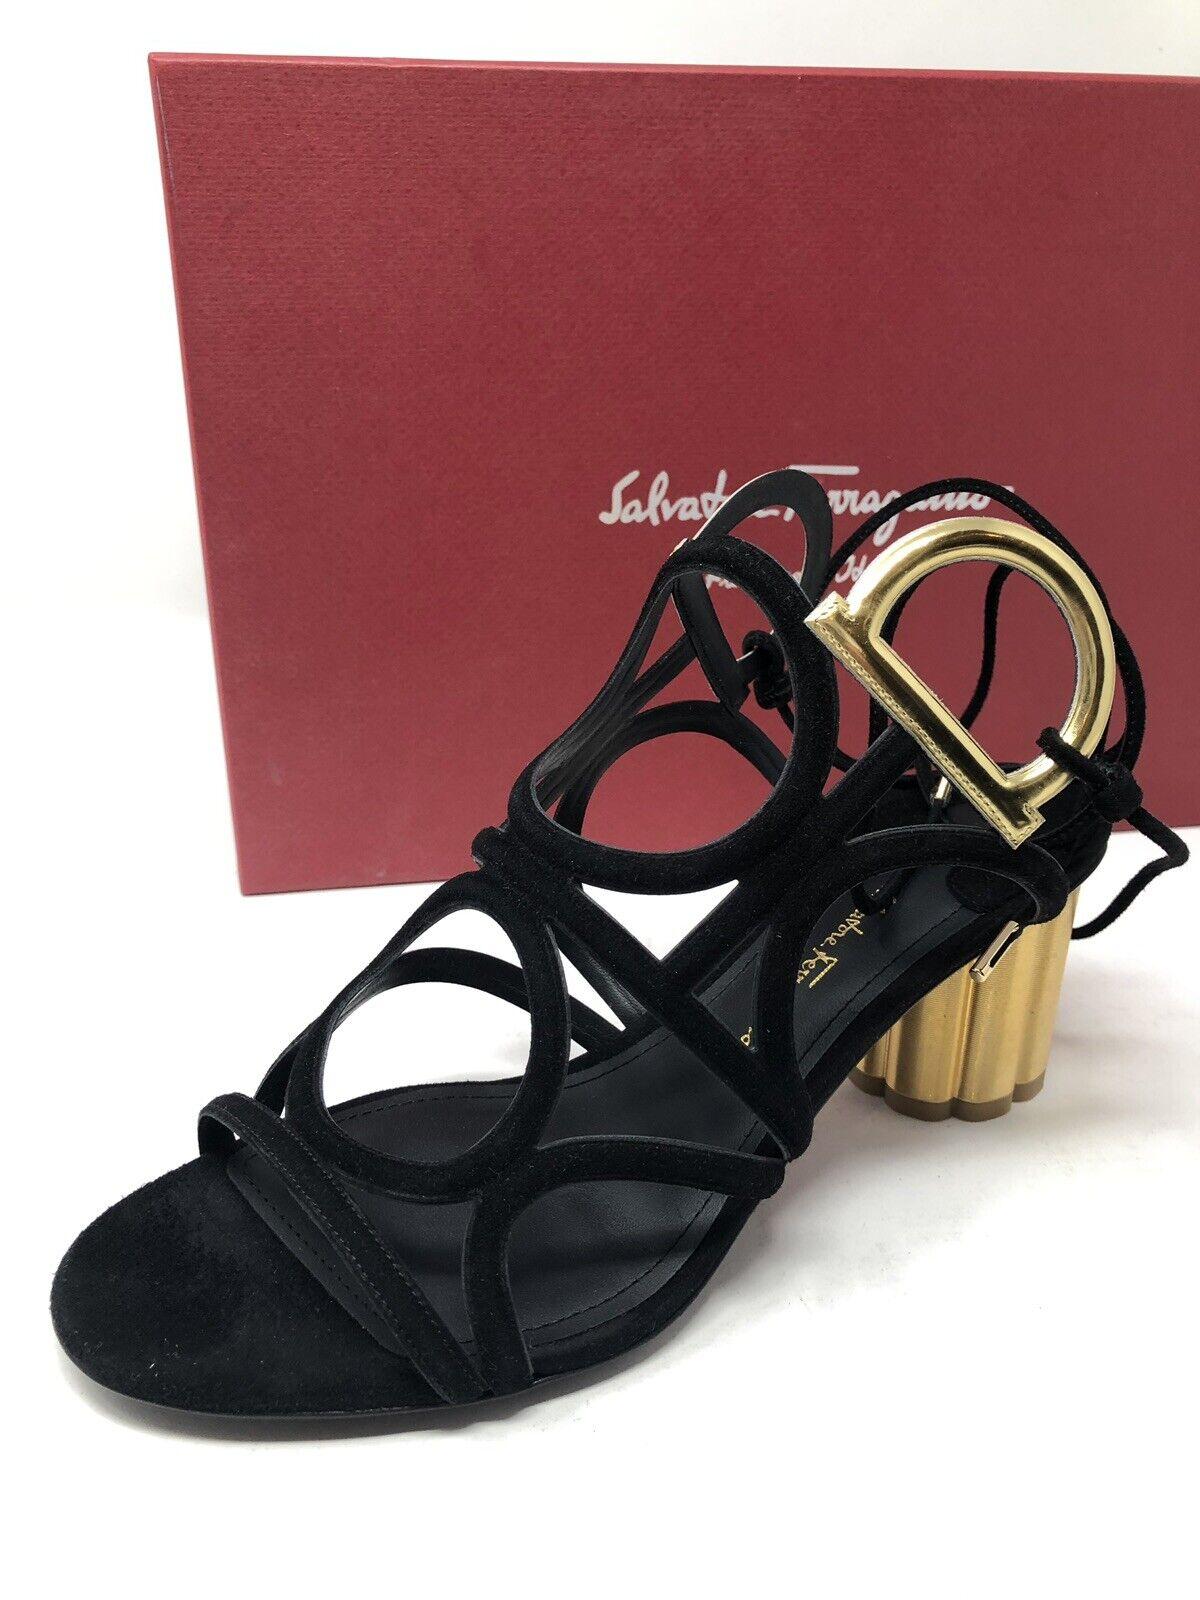 850 New Salvatore Ferragamo Womens Black shoes Ladies Sandals Flower Heels 6.5